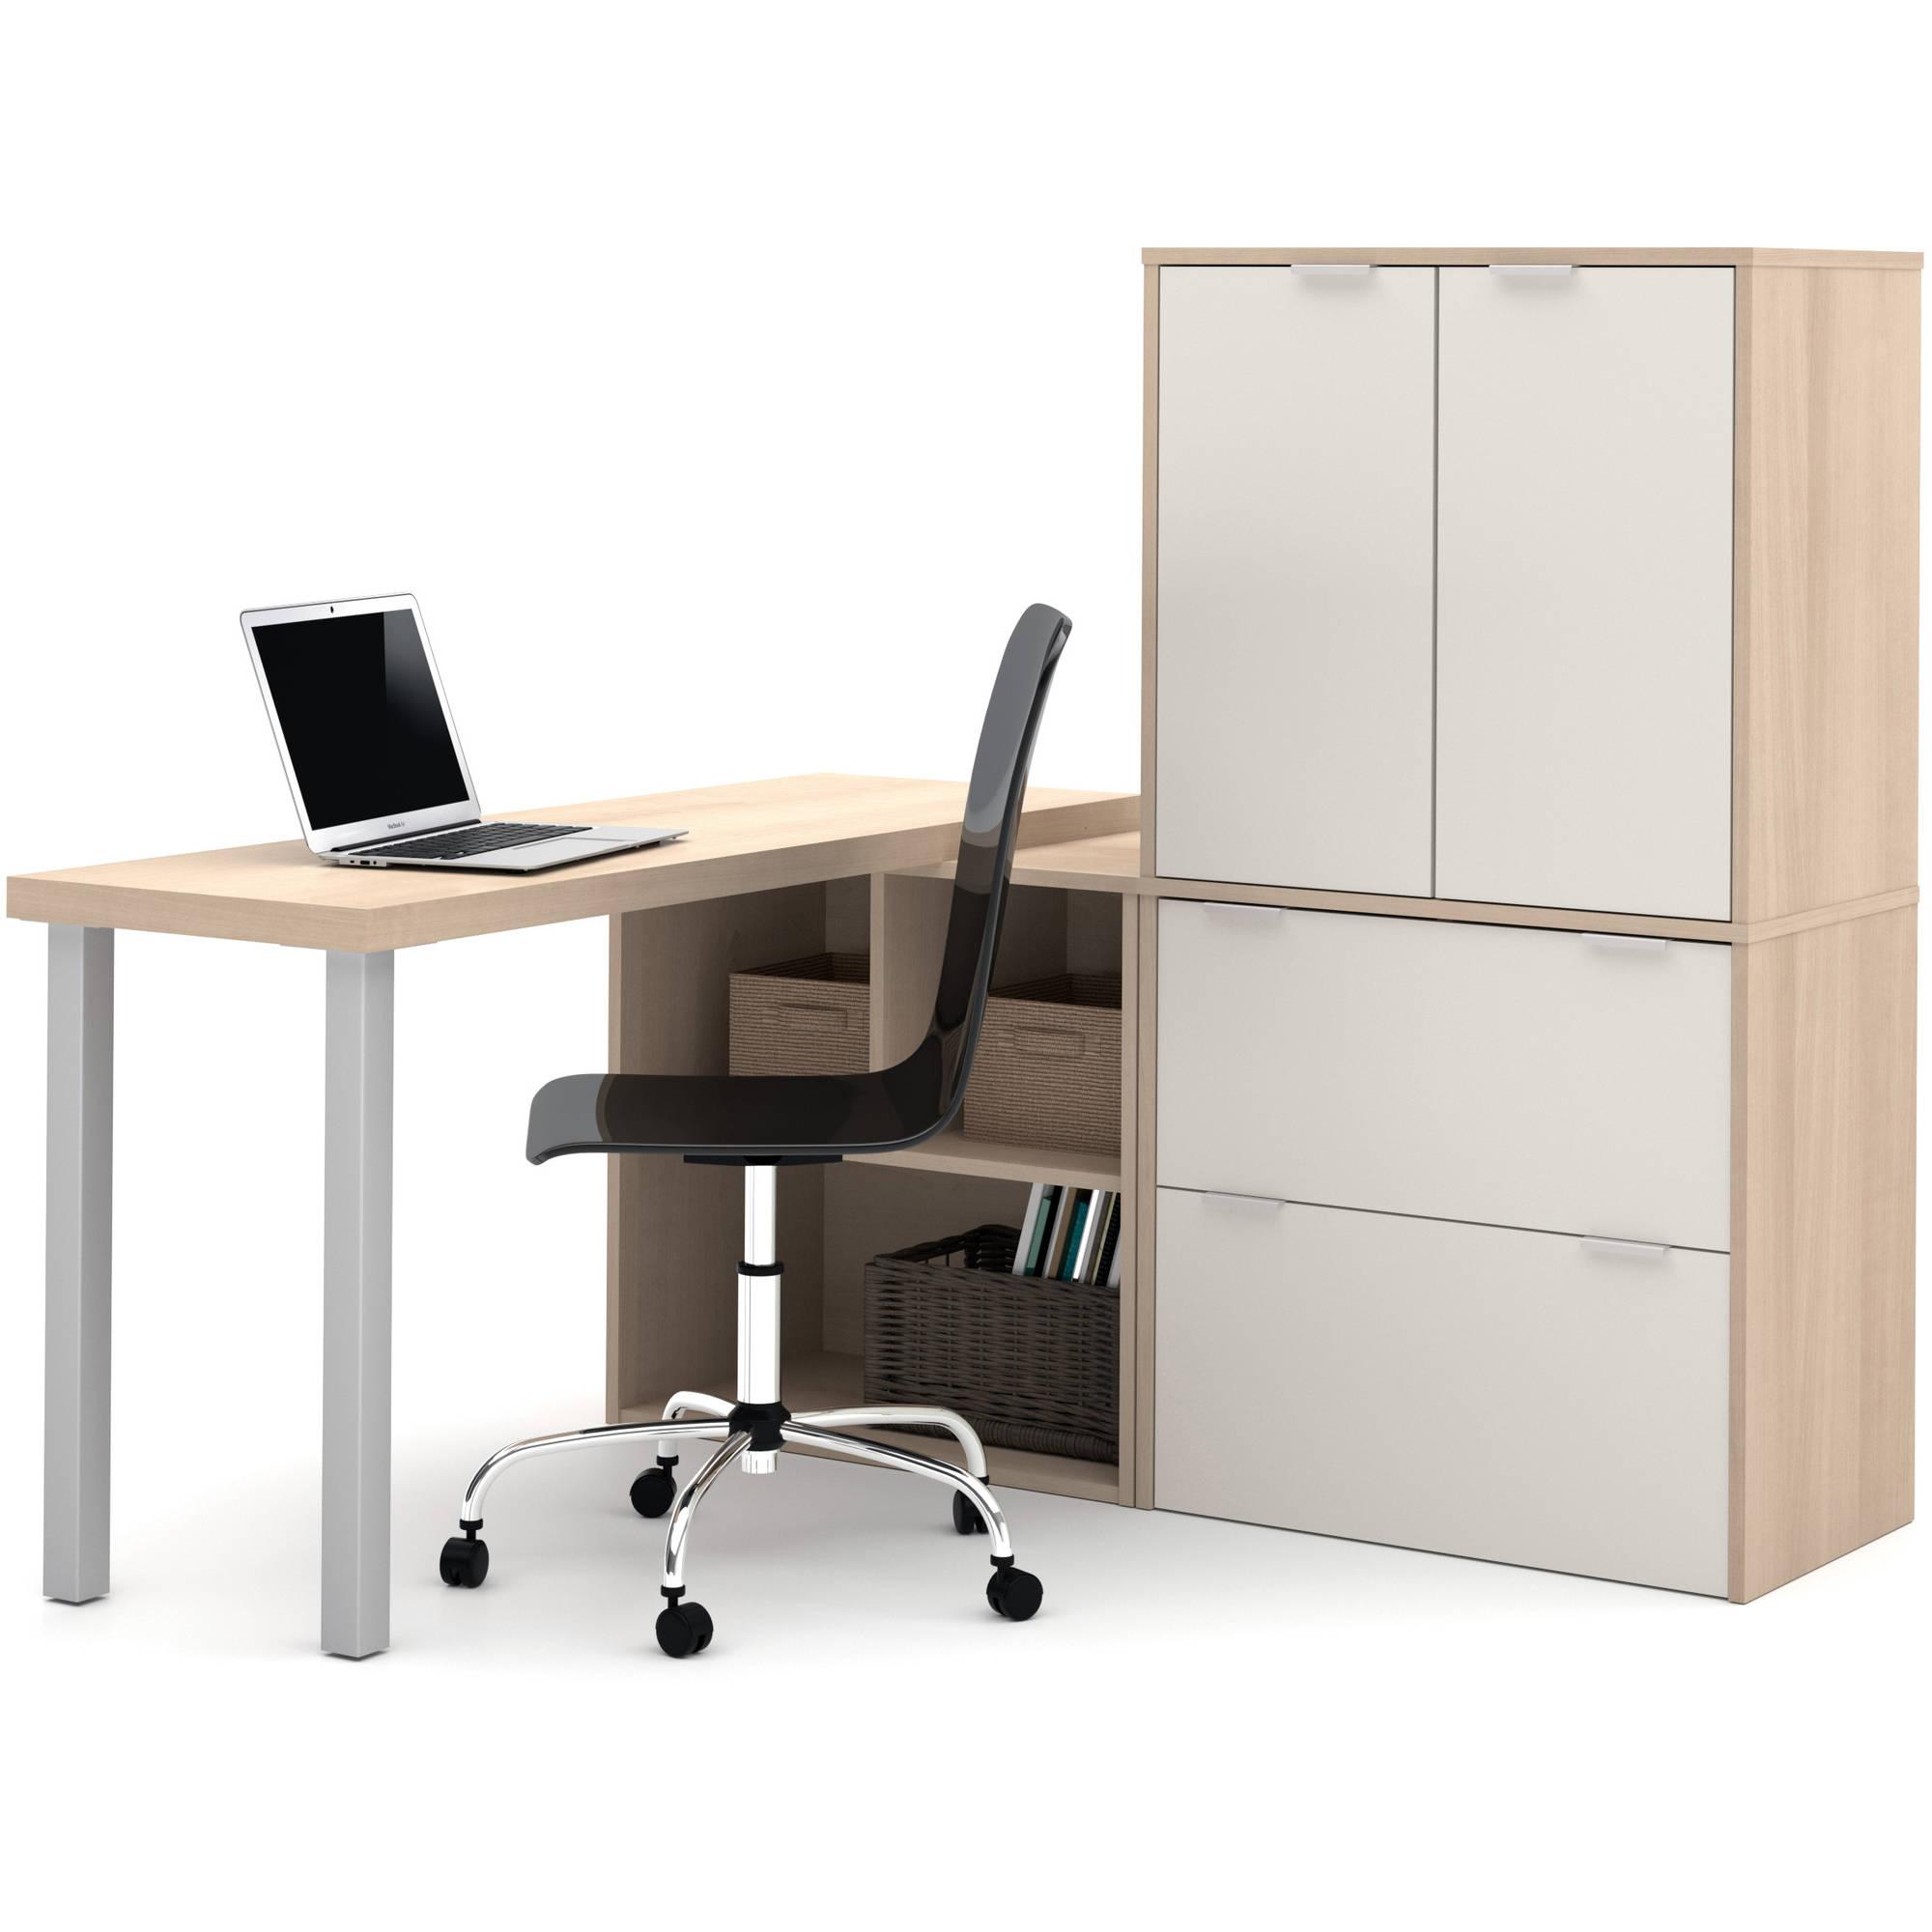 Bestar i3 by Bestar L-Shaped Desk, Multiple Colors